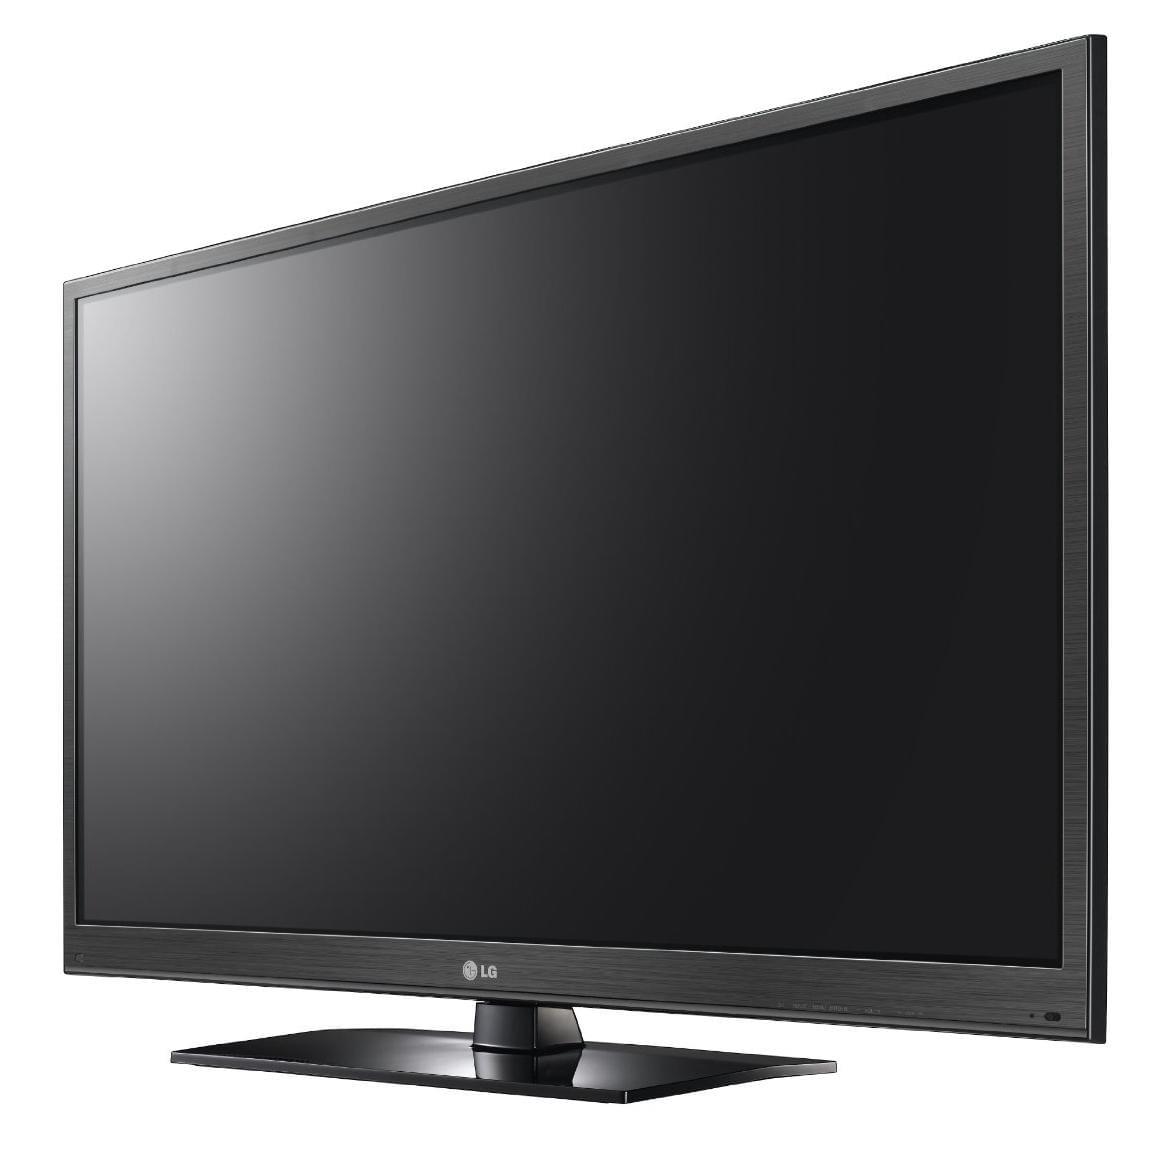 "LG 50PW451 3D READY - 50"" (127cm) HDTV  600Hz - TV LG - 0"